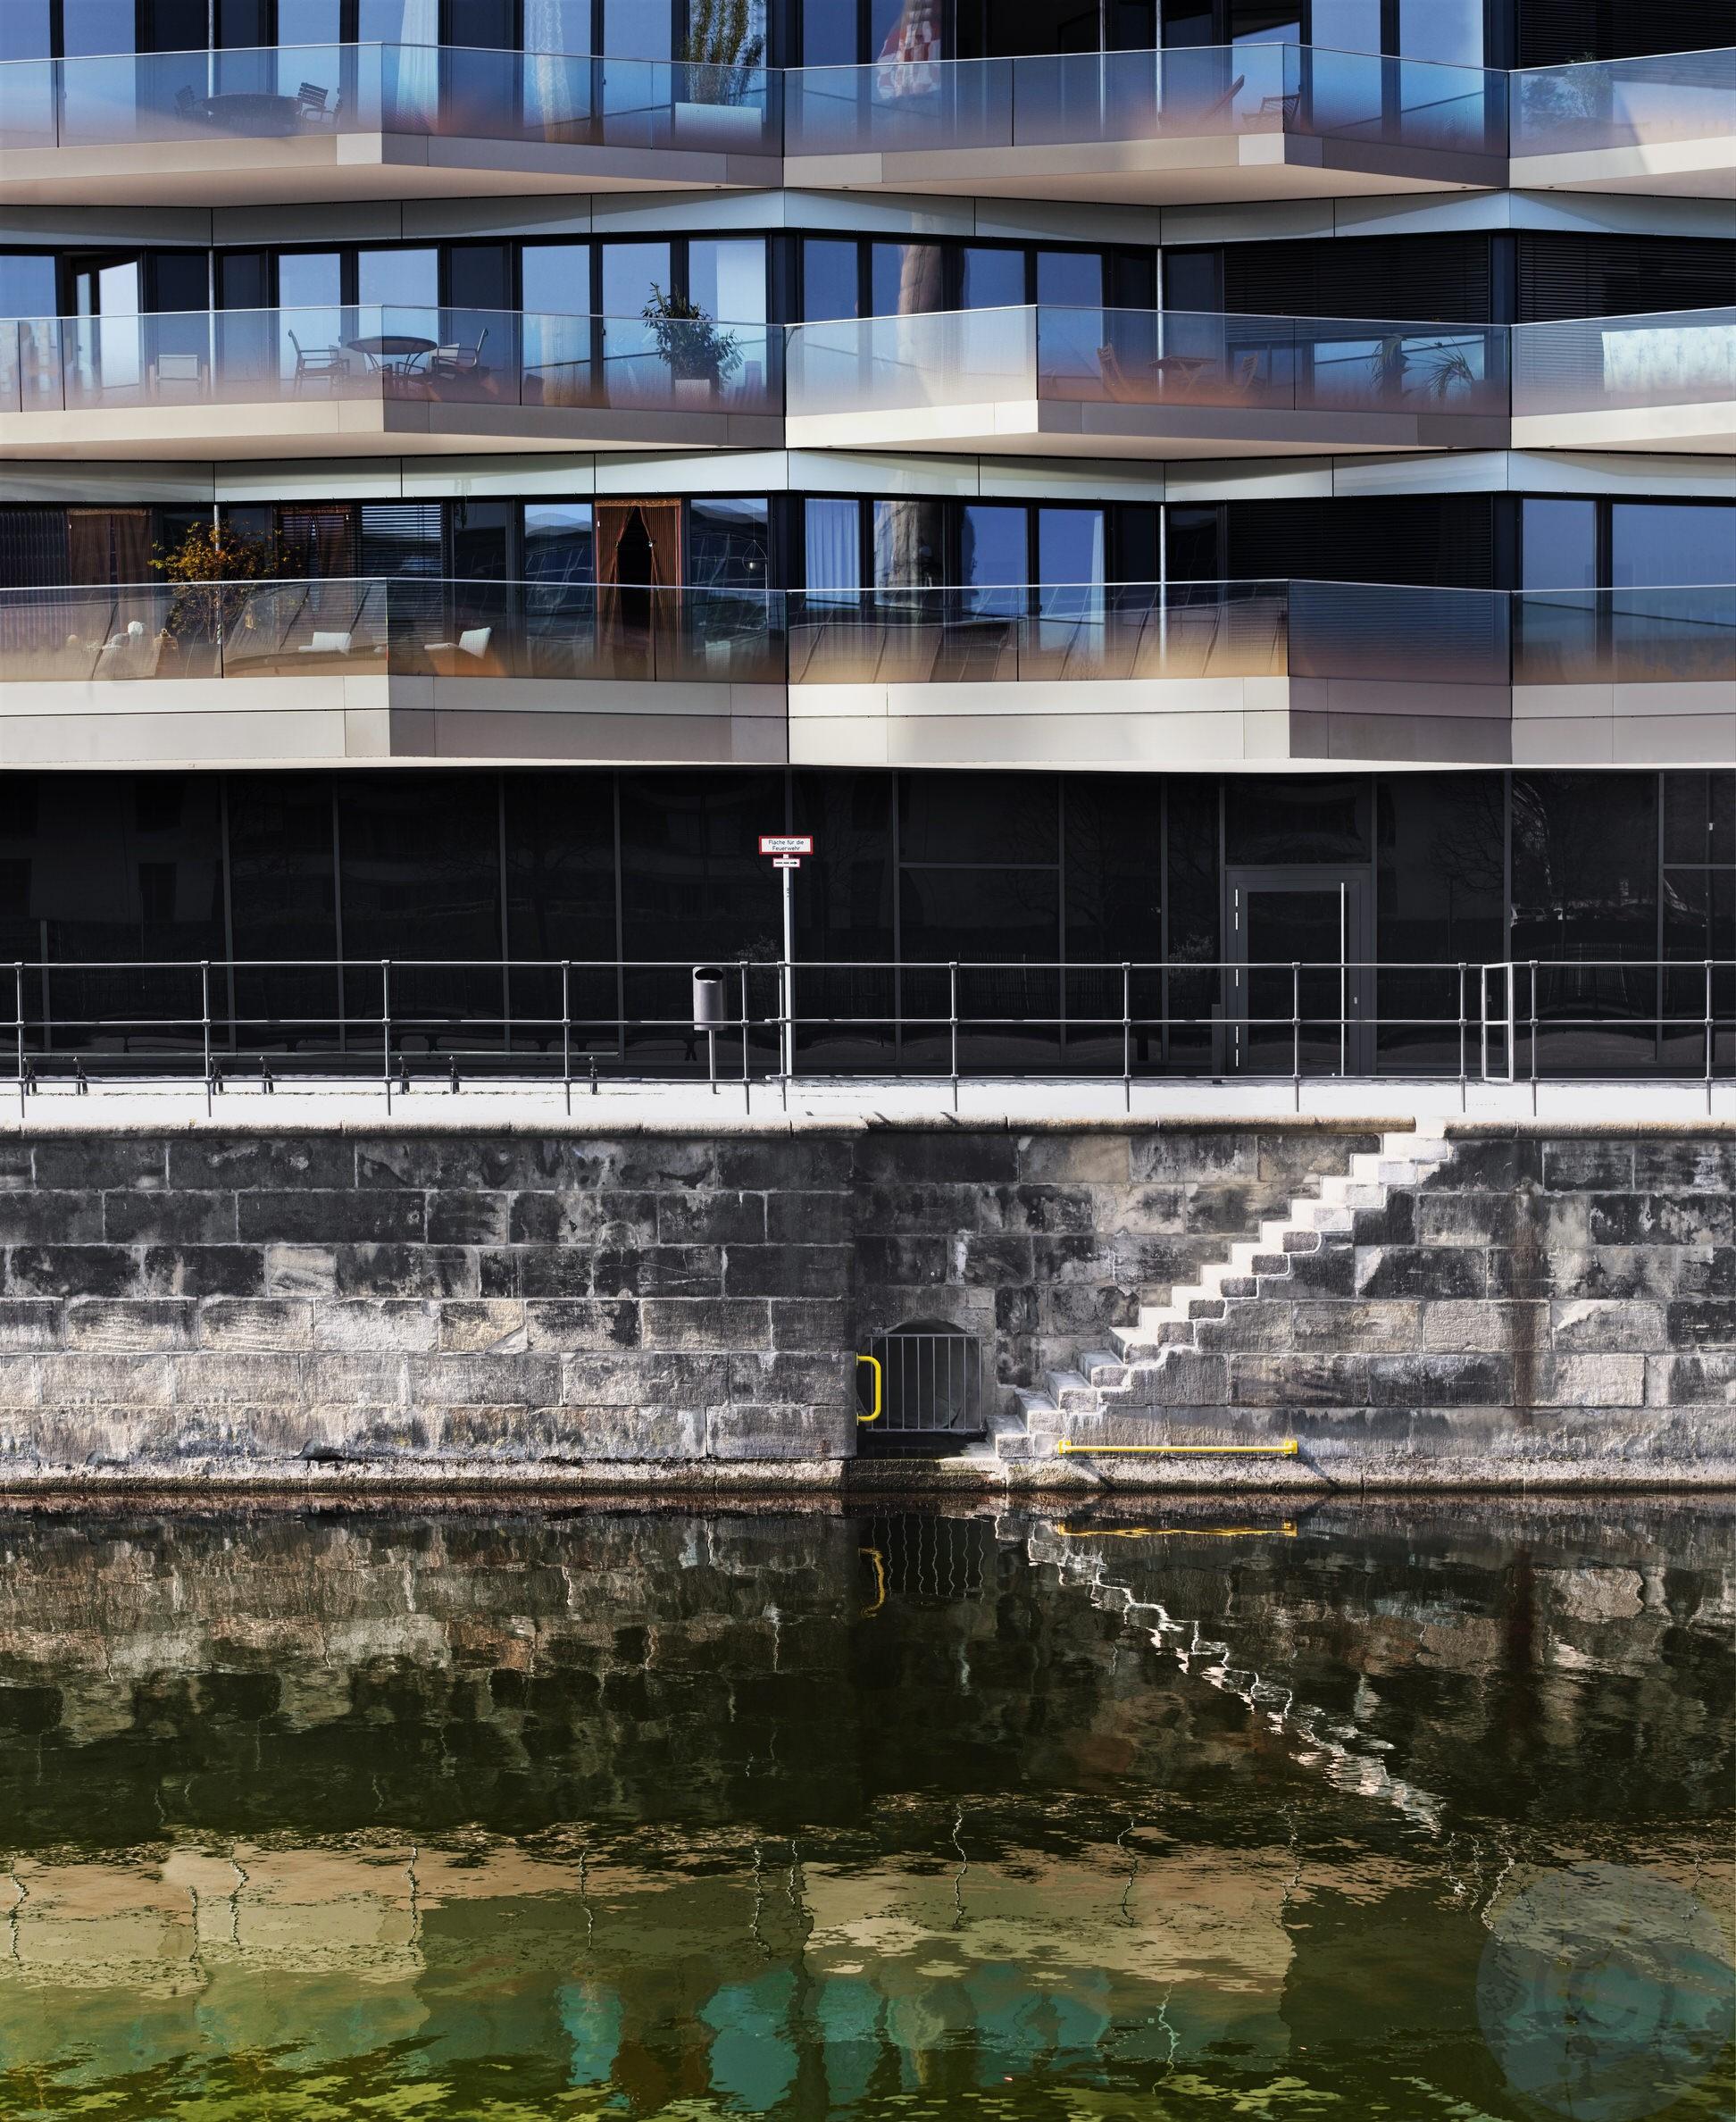 Am Spandaukanal - KunstCampus -Europacity Berlin - léonwohlhage architects, 2017